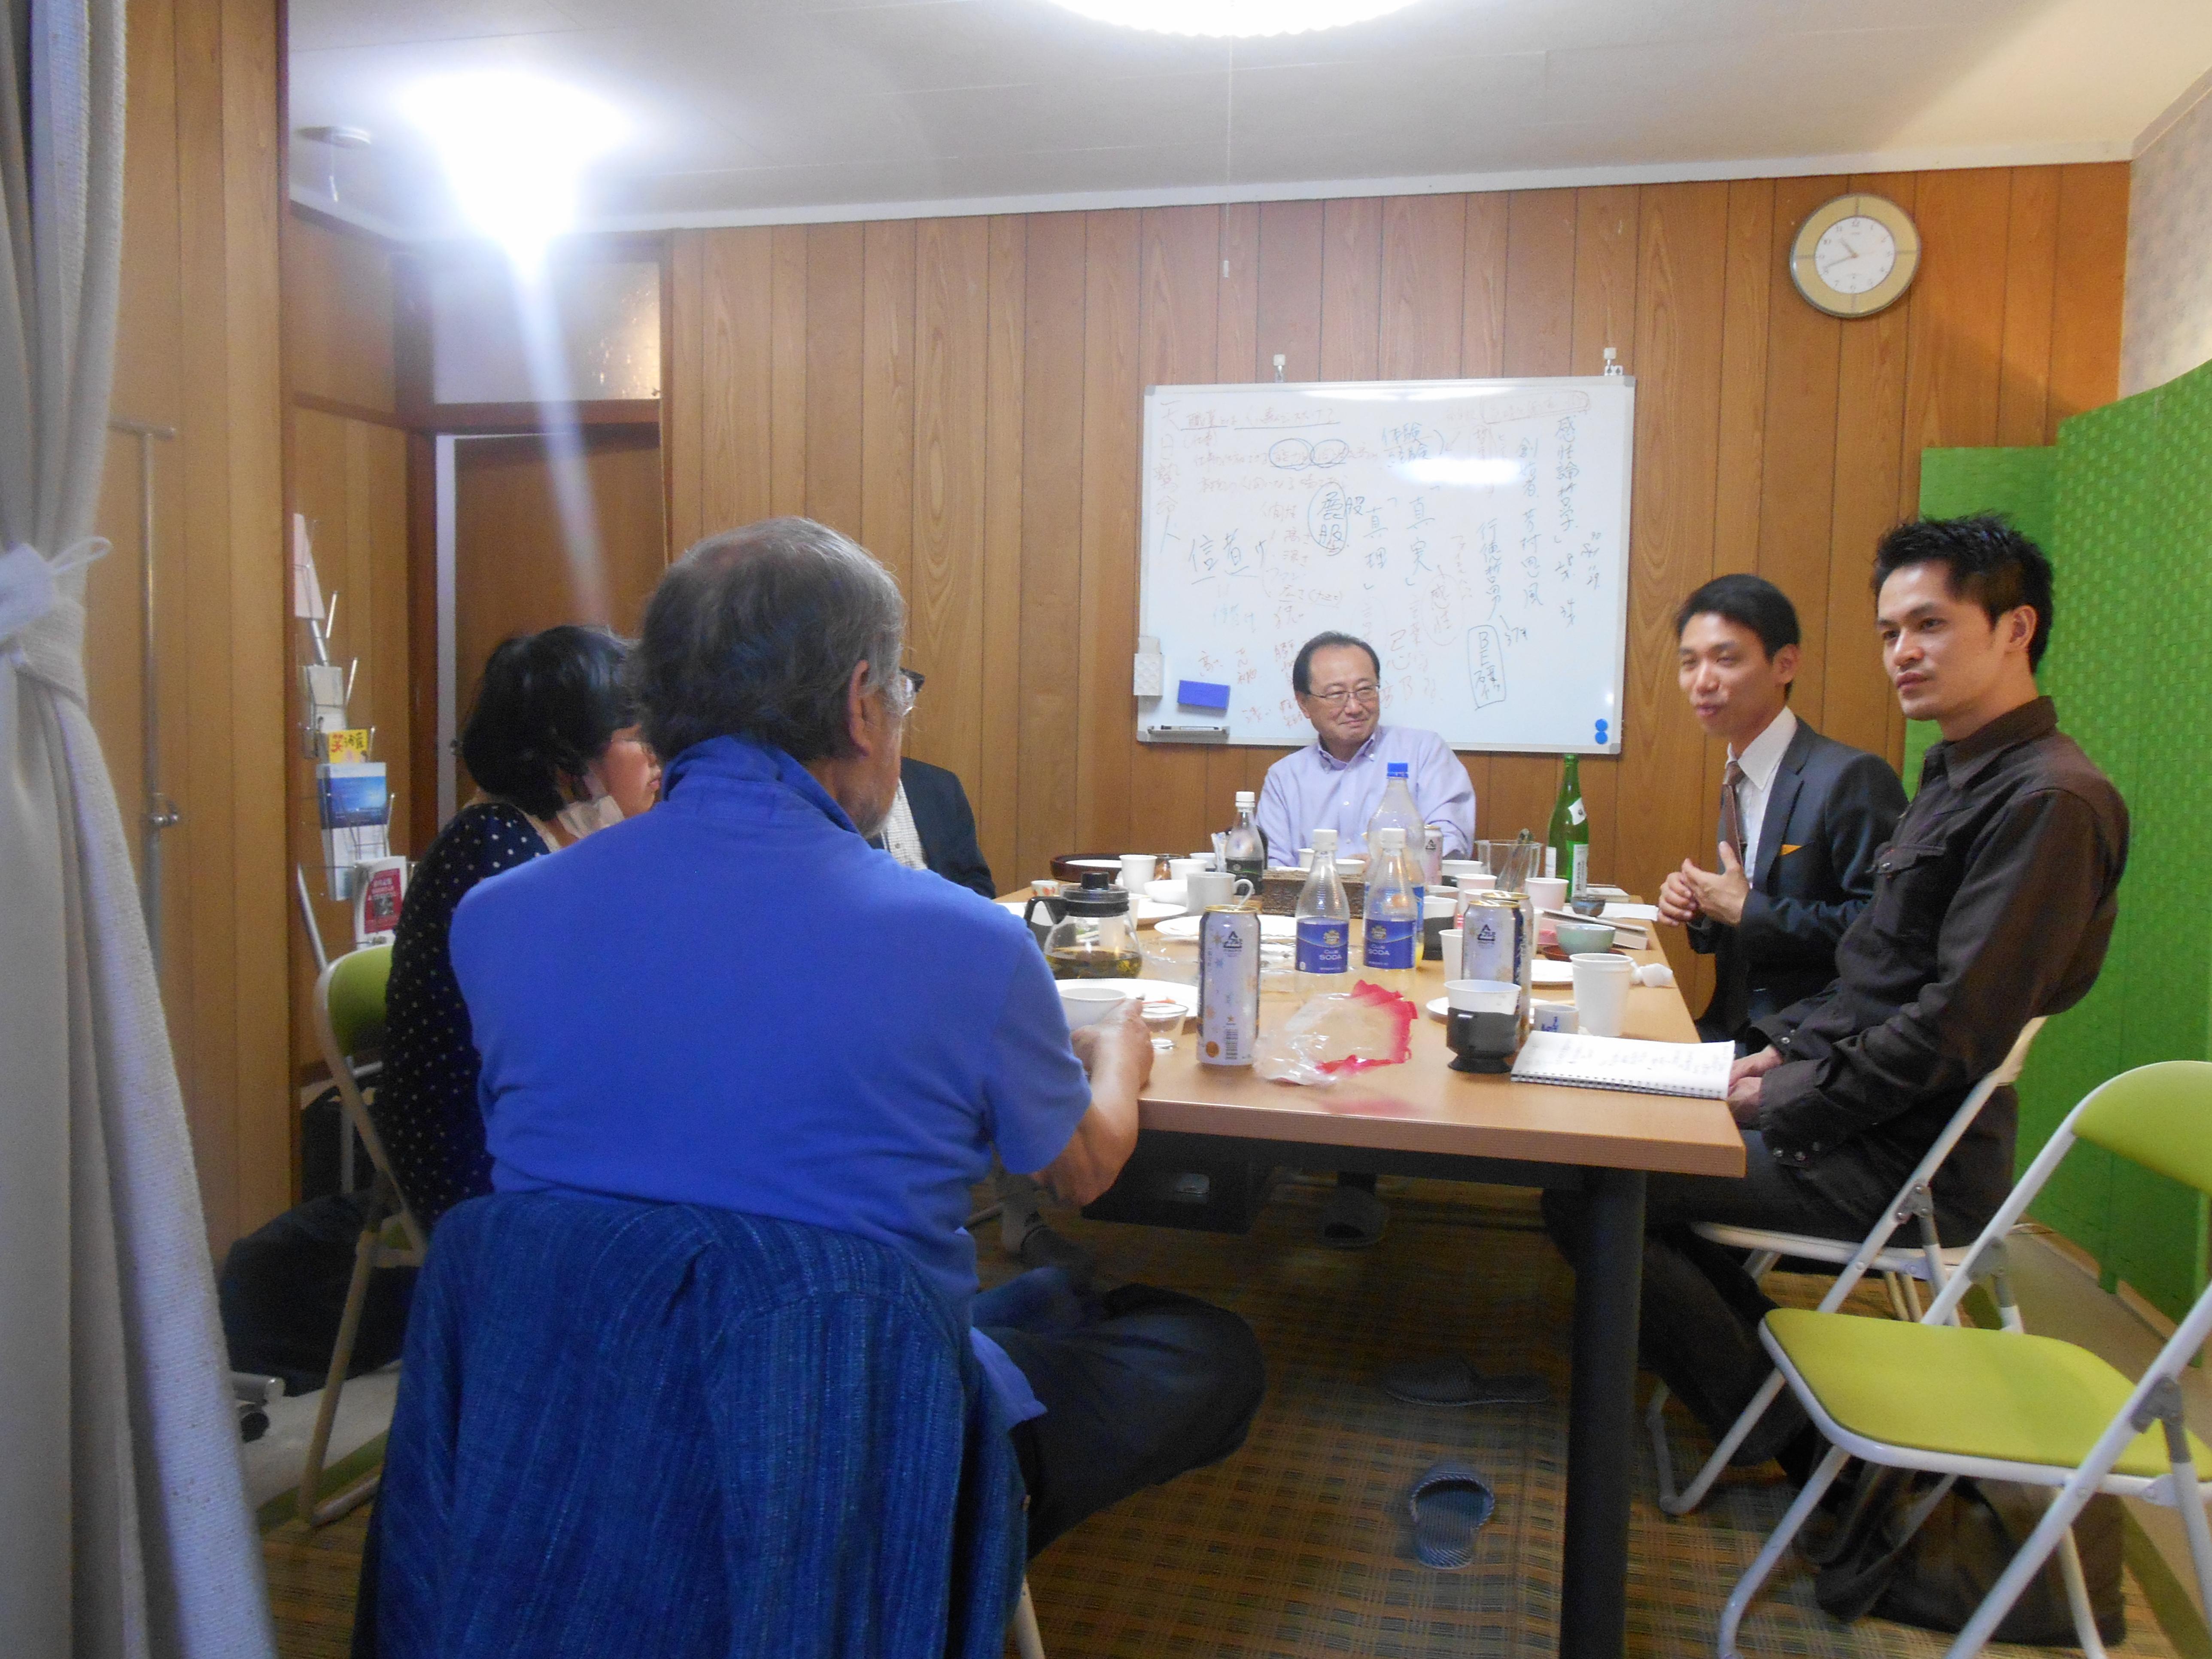 DSCN5859 - 平成30年度 東京思風塾 4月7日(土)「時代が問題をつくり、問題が人物をつくる」